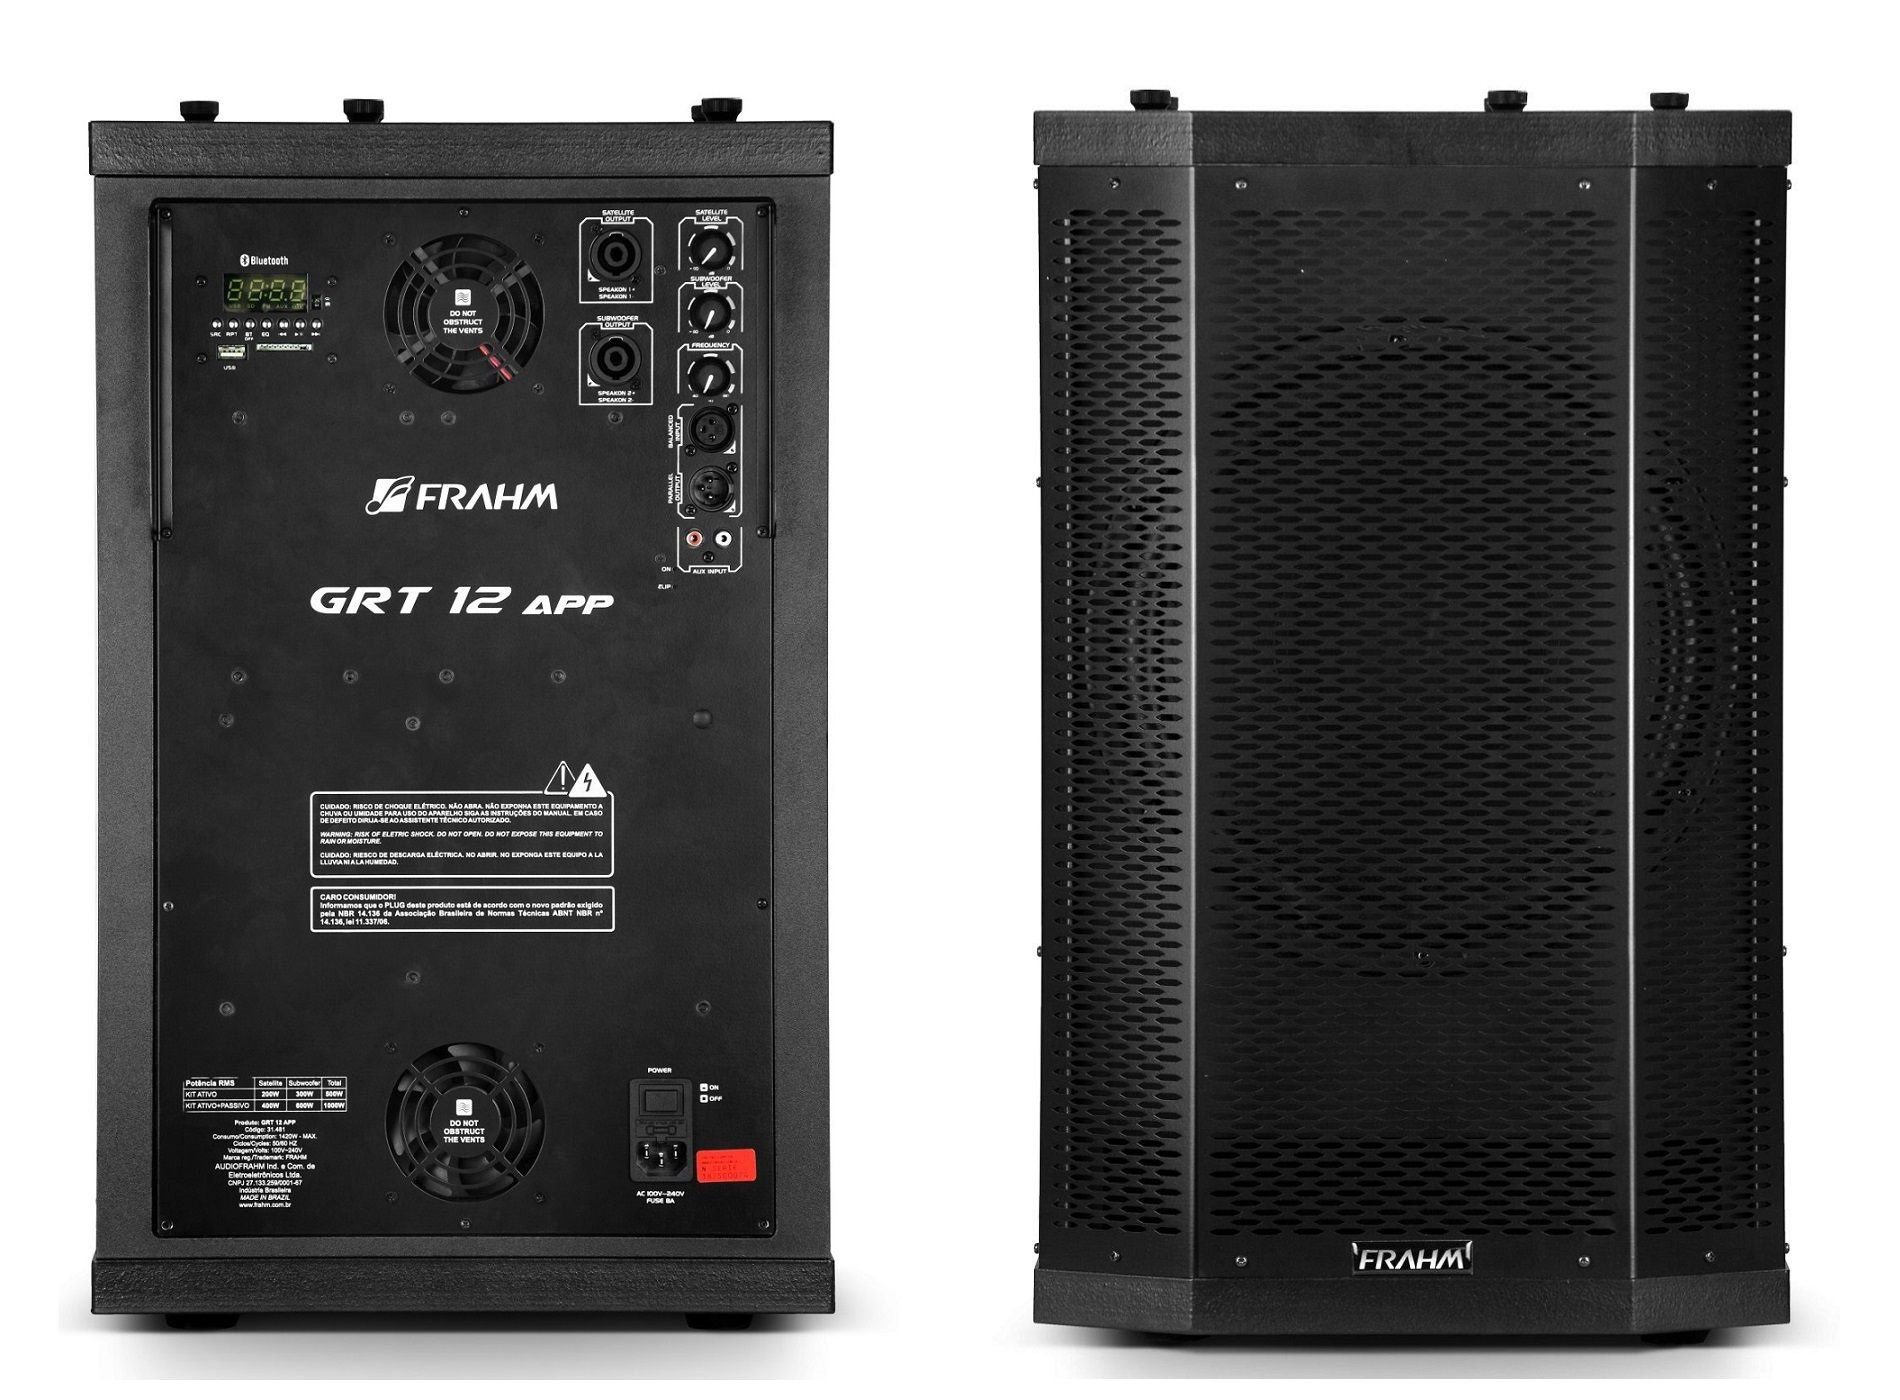 Sistema Pa Ativo E Passivo 1000W Sub Woofer Grt12 App + Gr12 Frahm